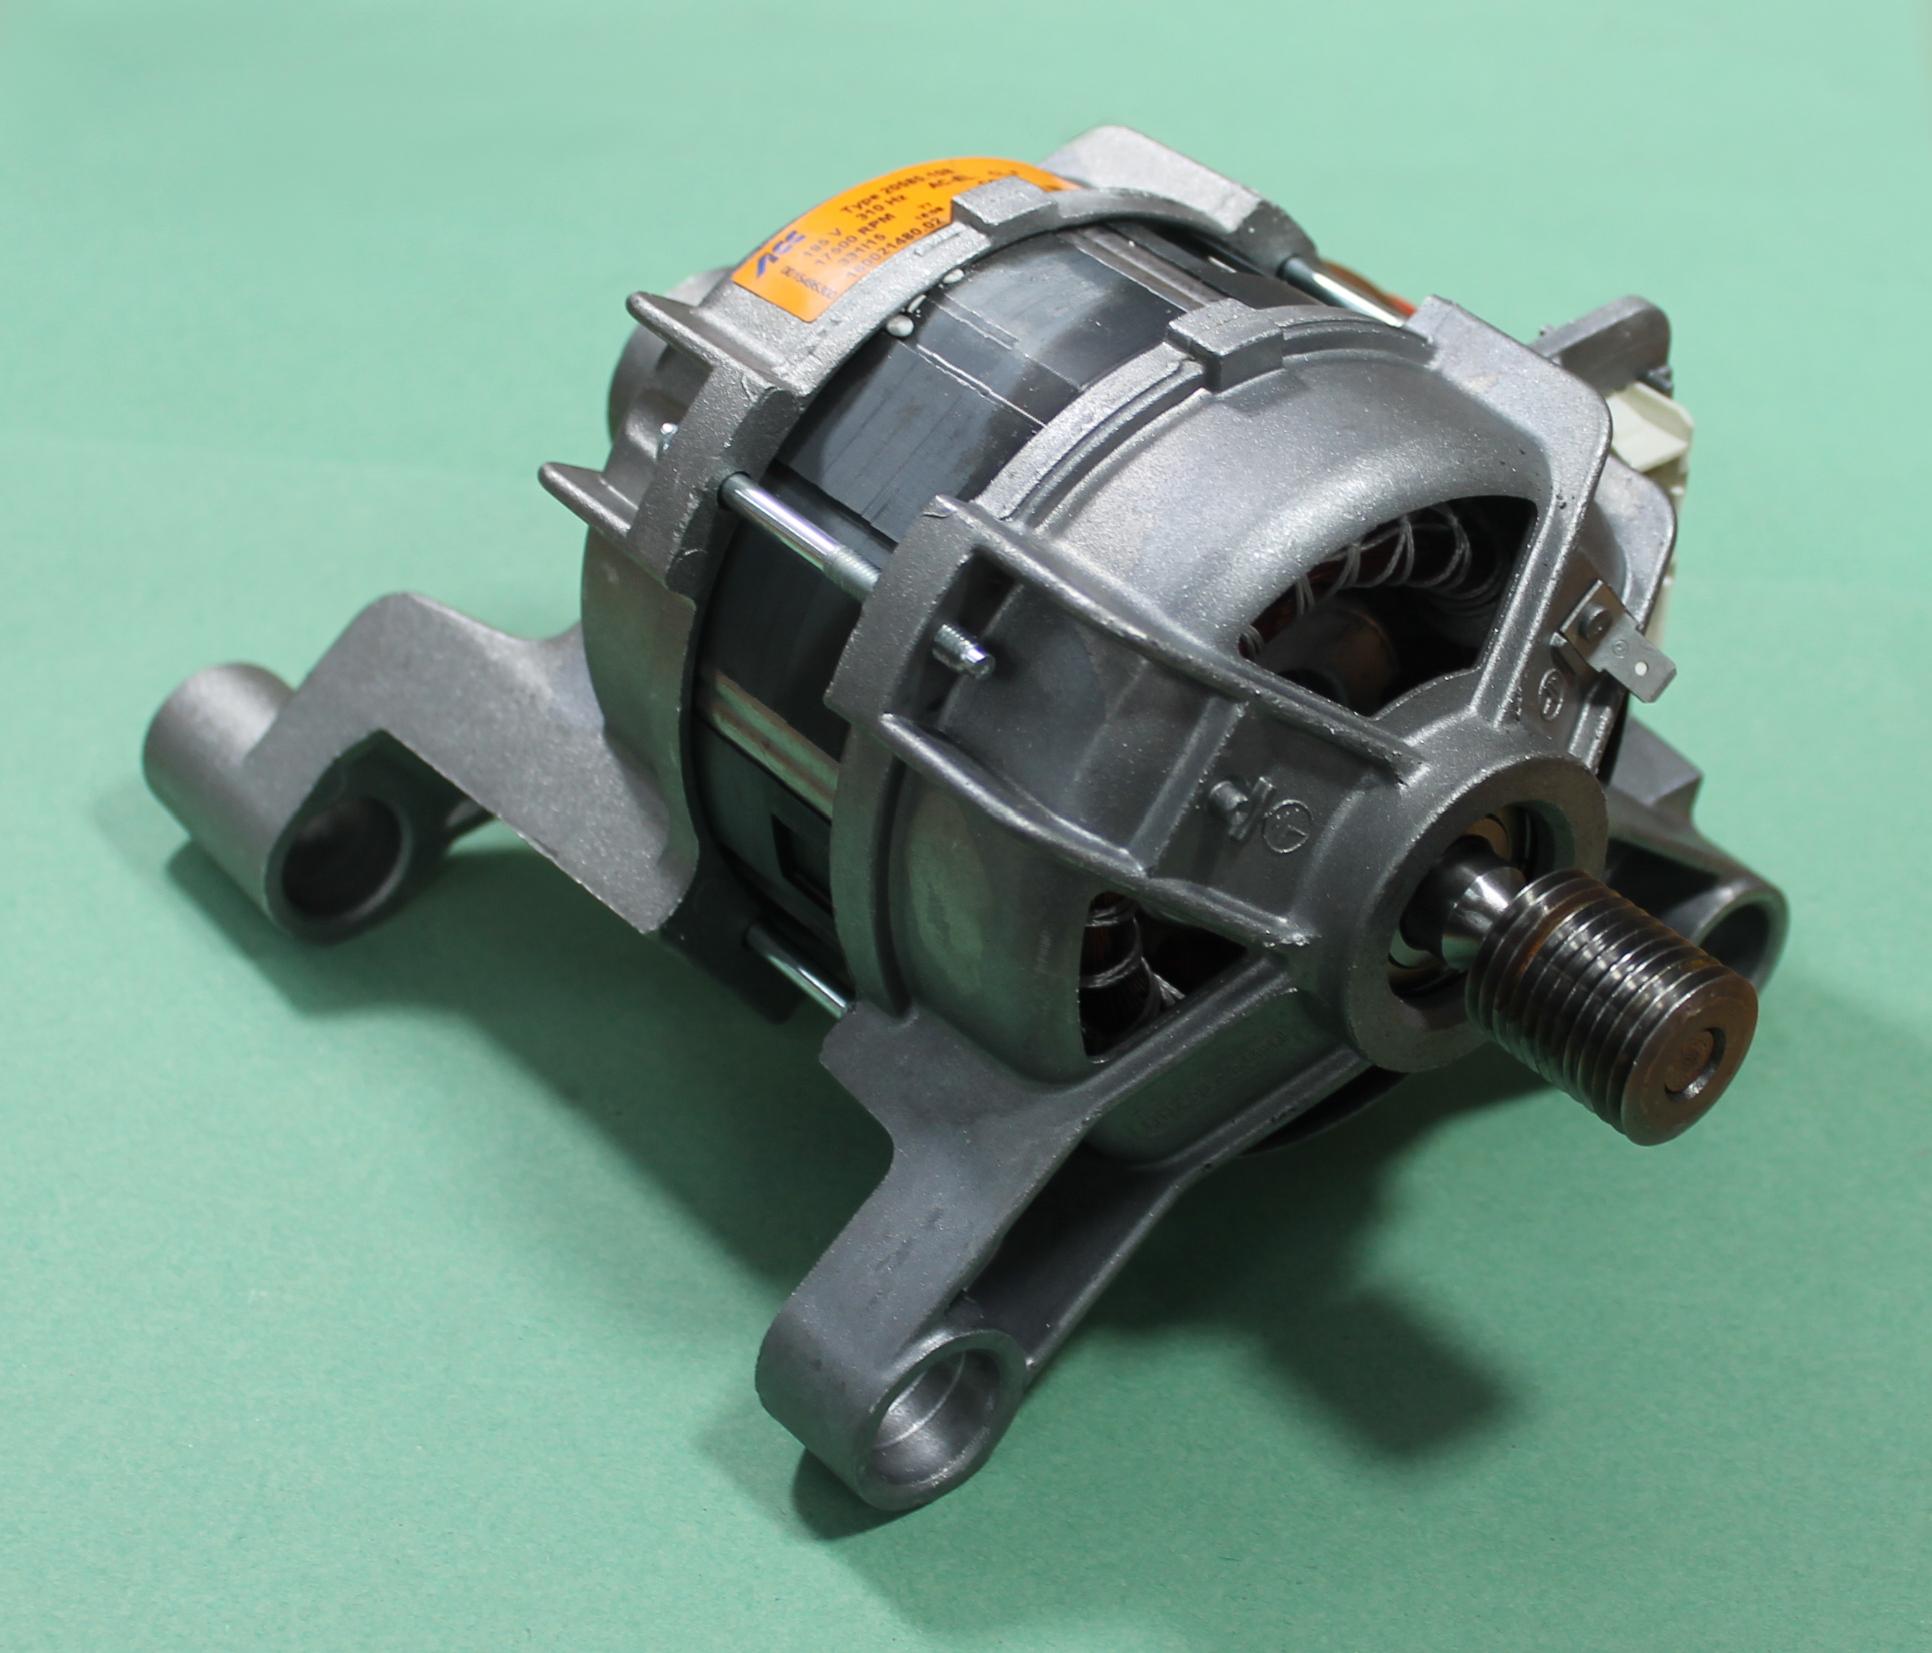 Hotpoint Bhwd129 Washer Dryer Motor Acc Ebay